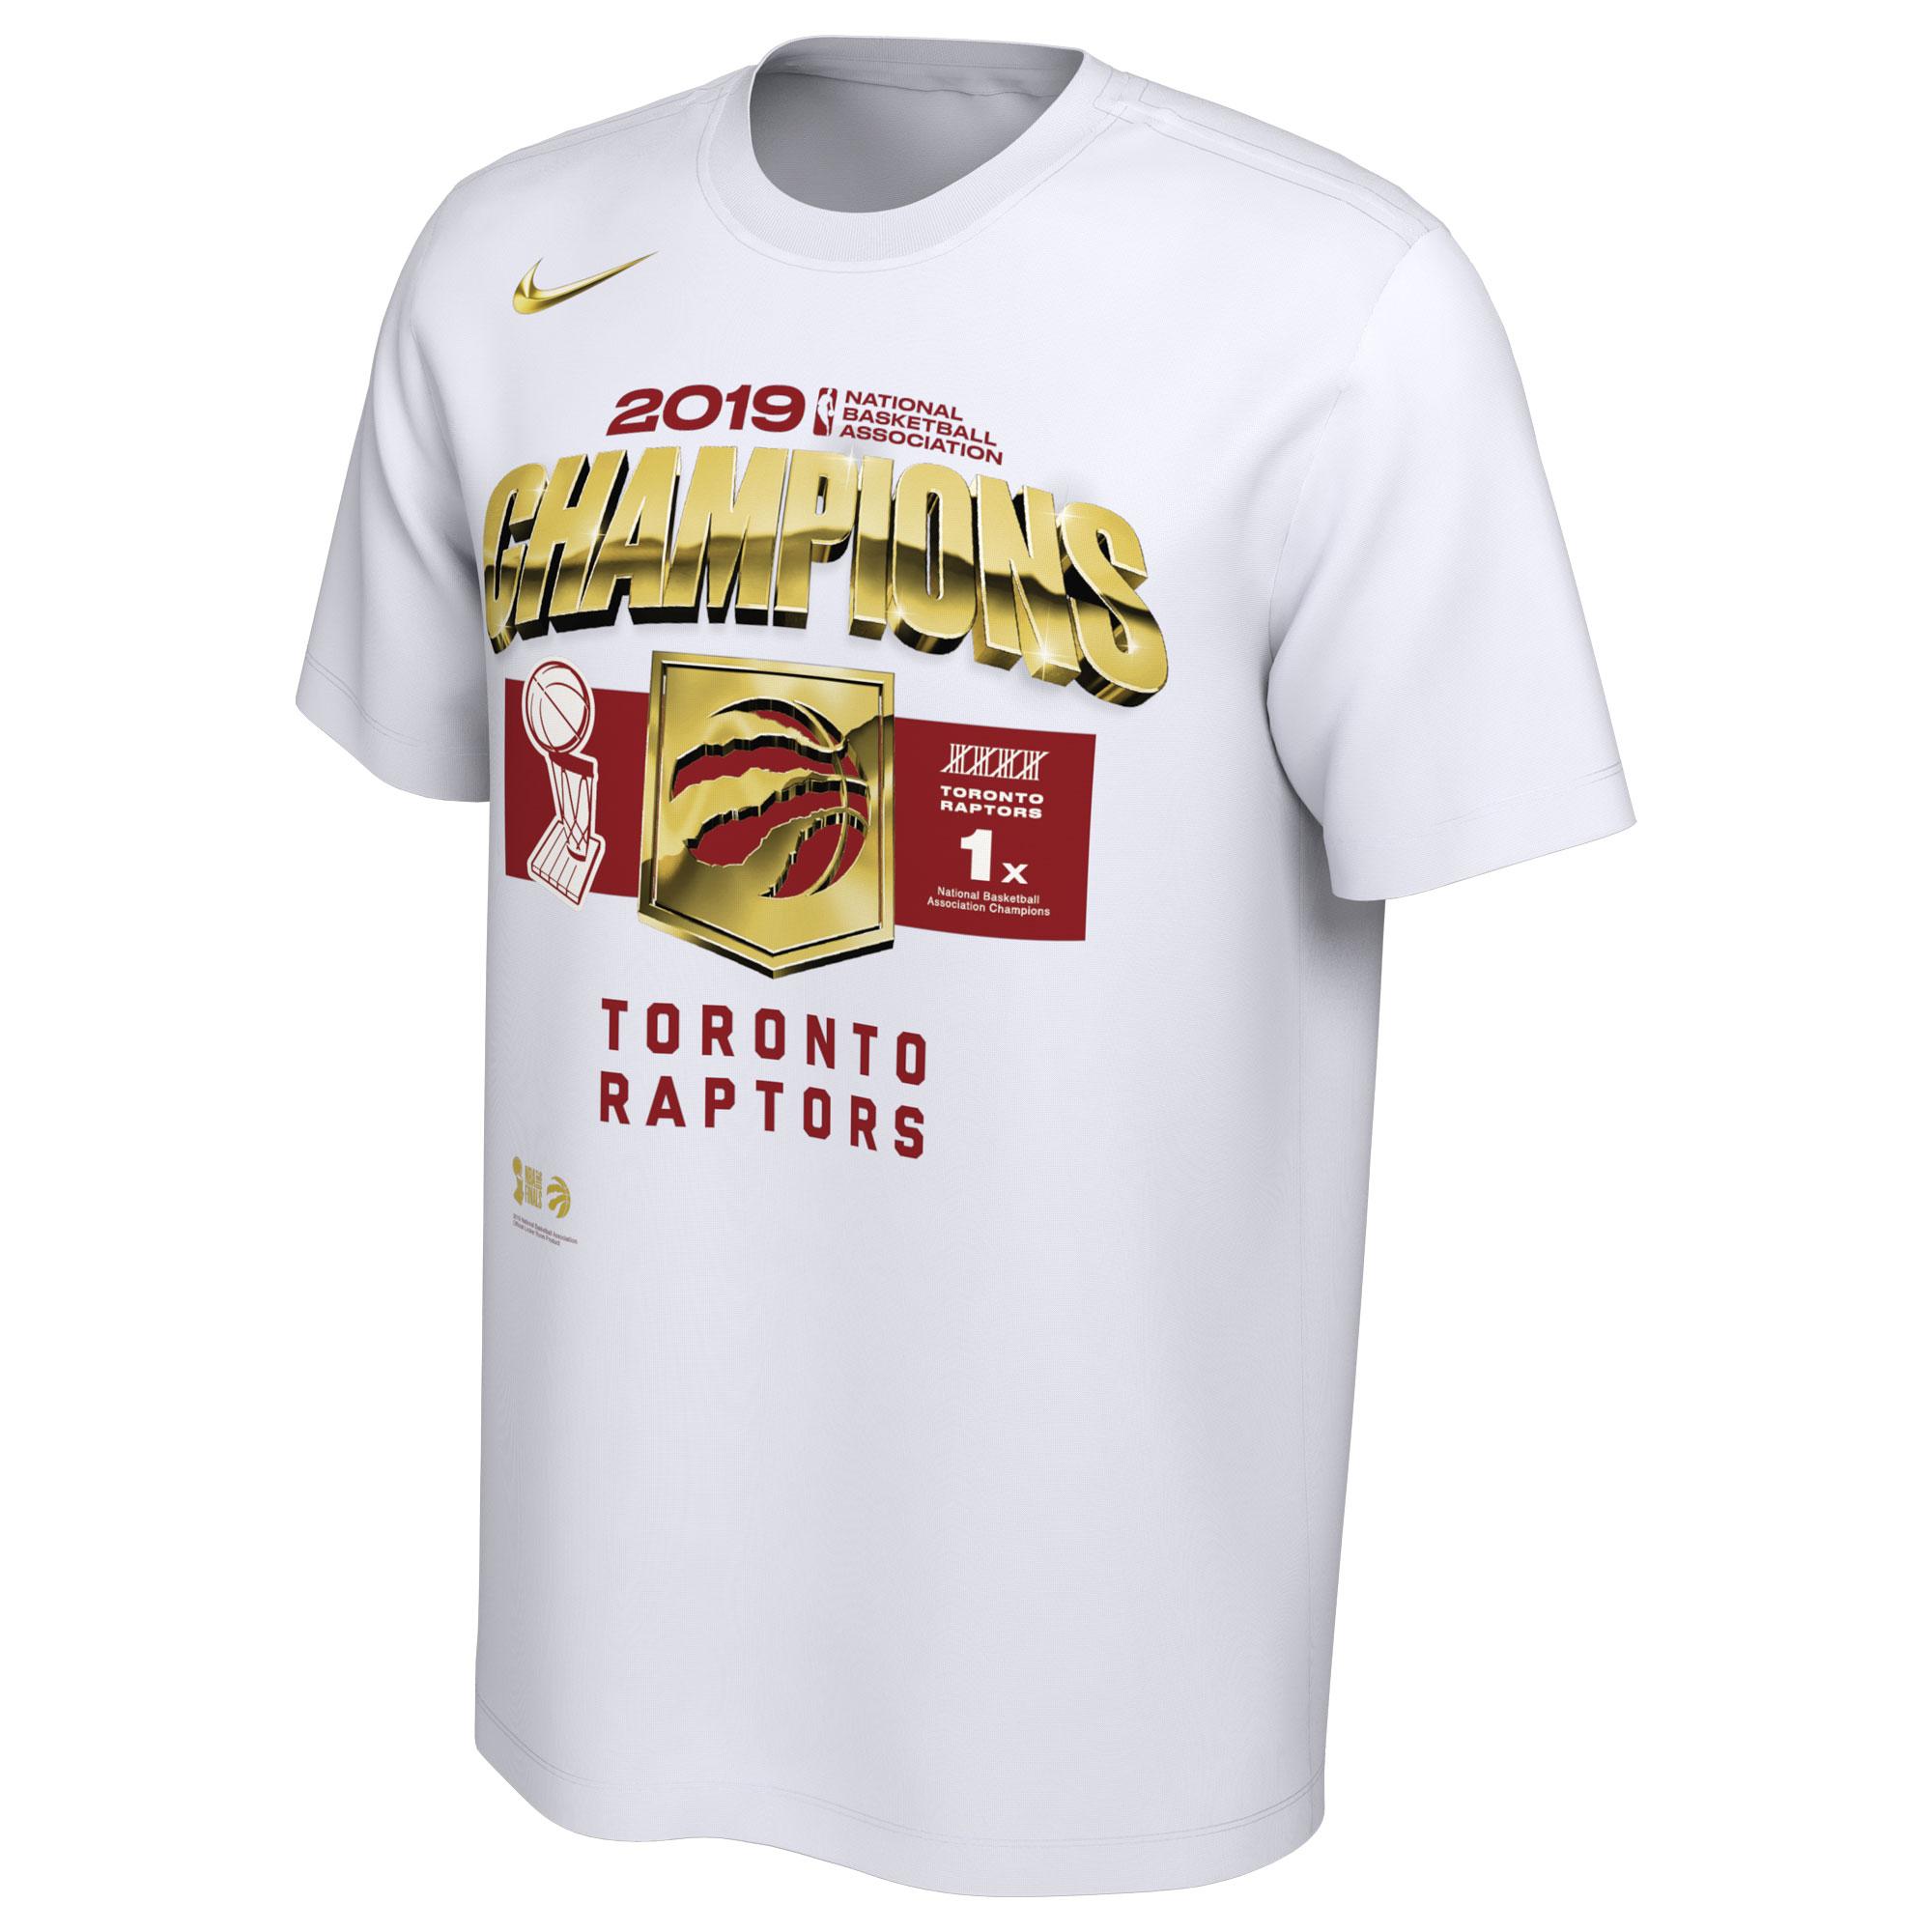 Toronto Raptors Nike 2019 NBA Finals Champions Locker Room T-Shirt - White